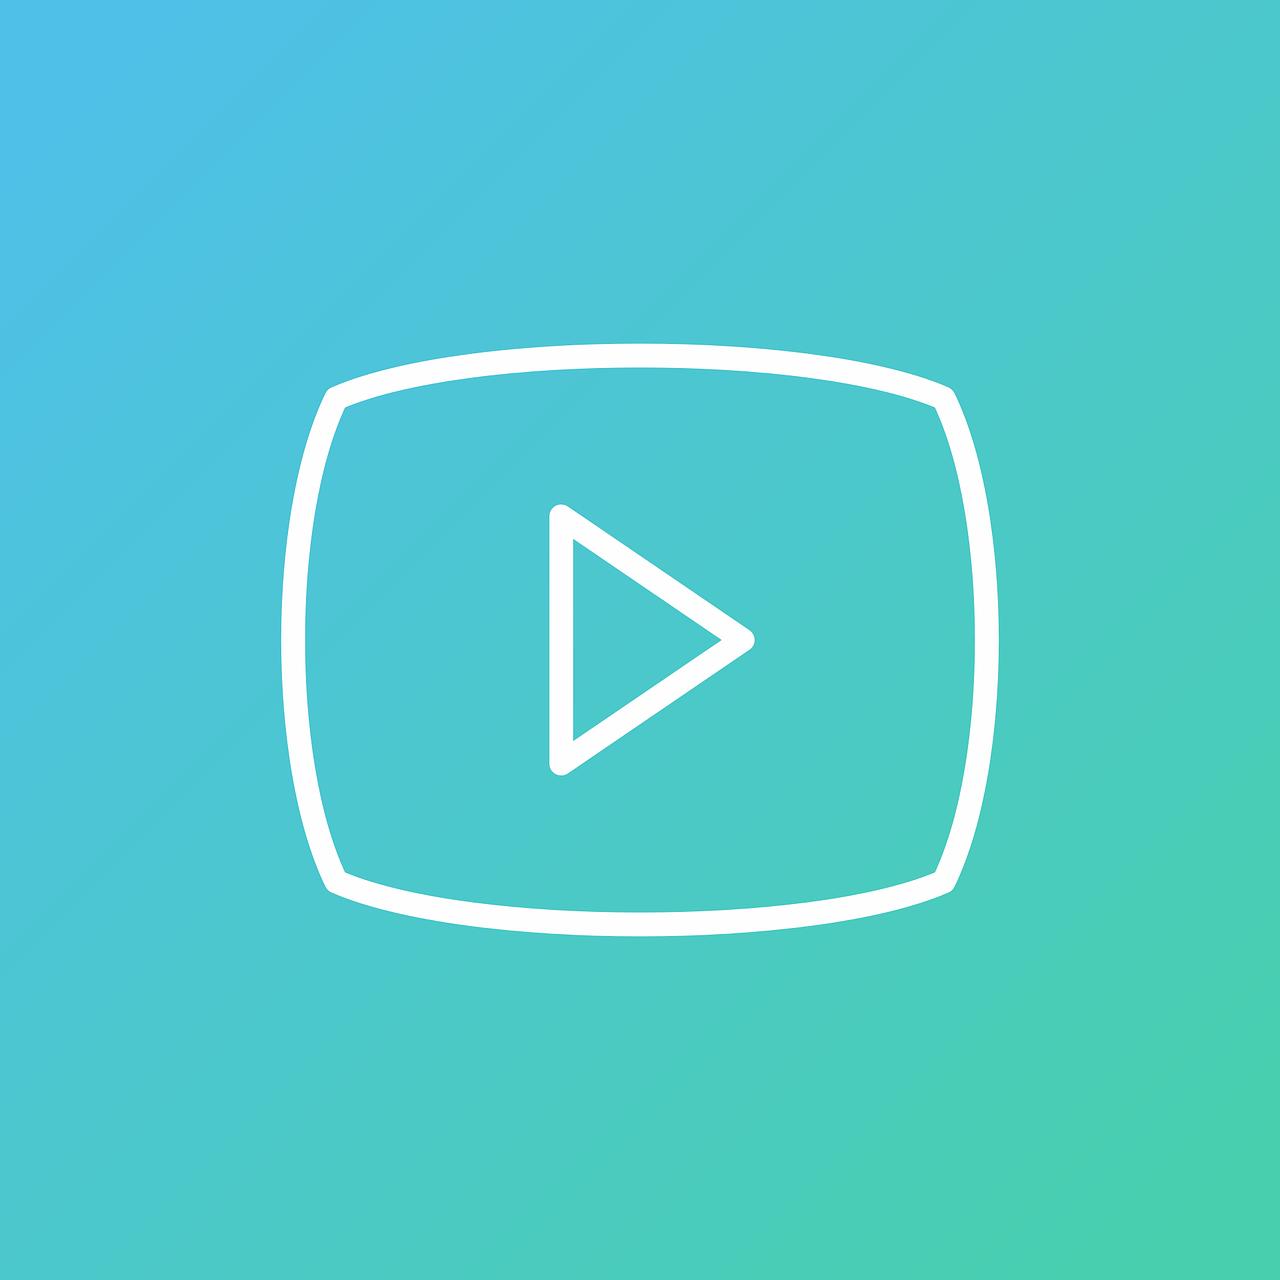 youtube-2170428_1280